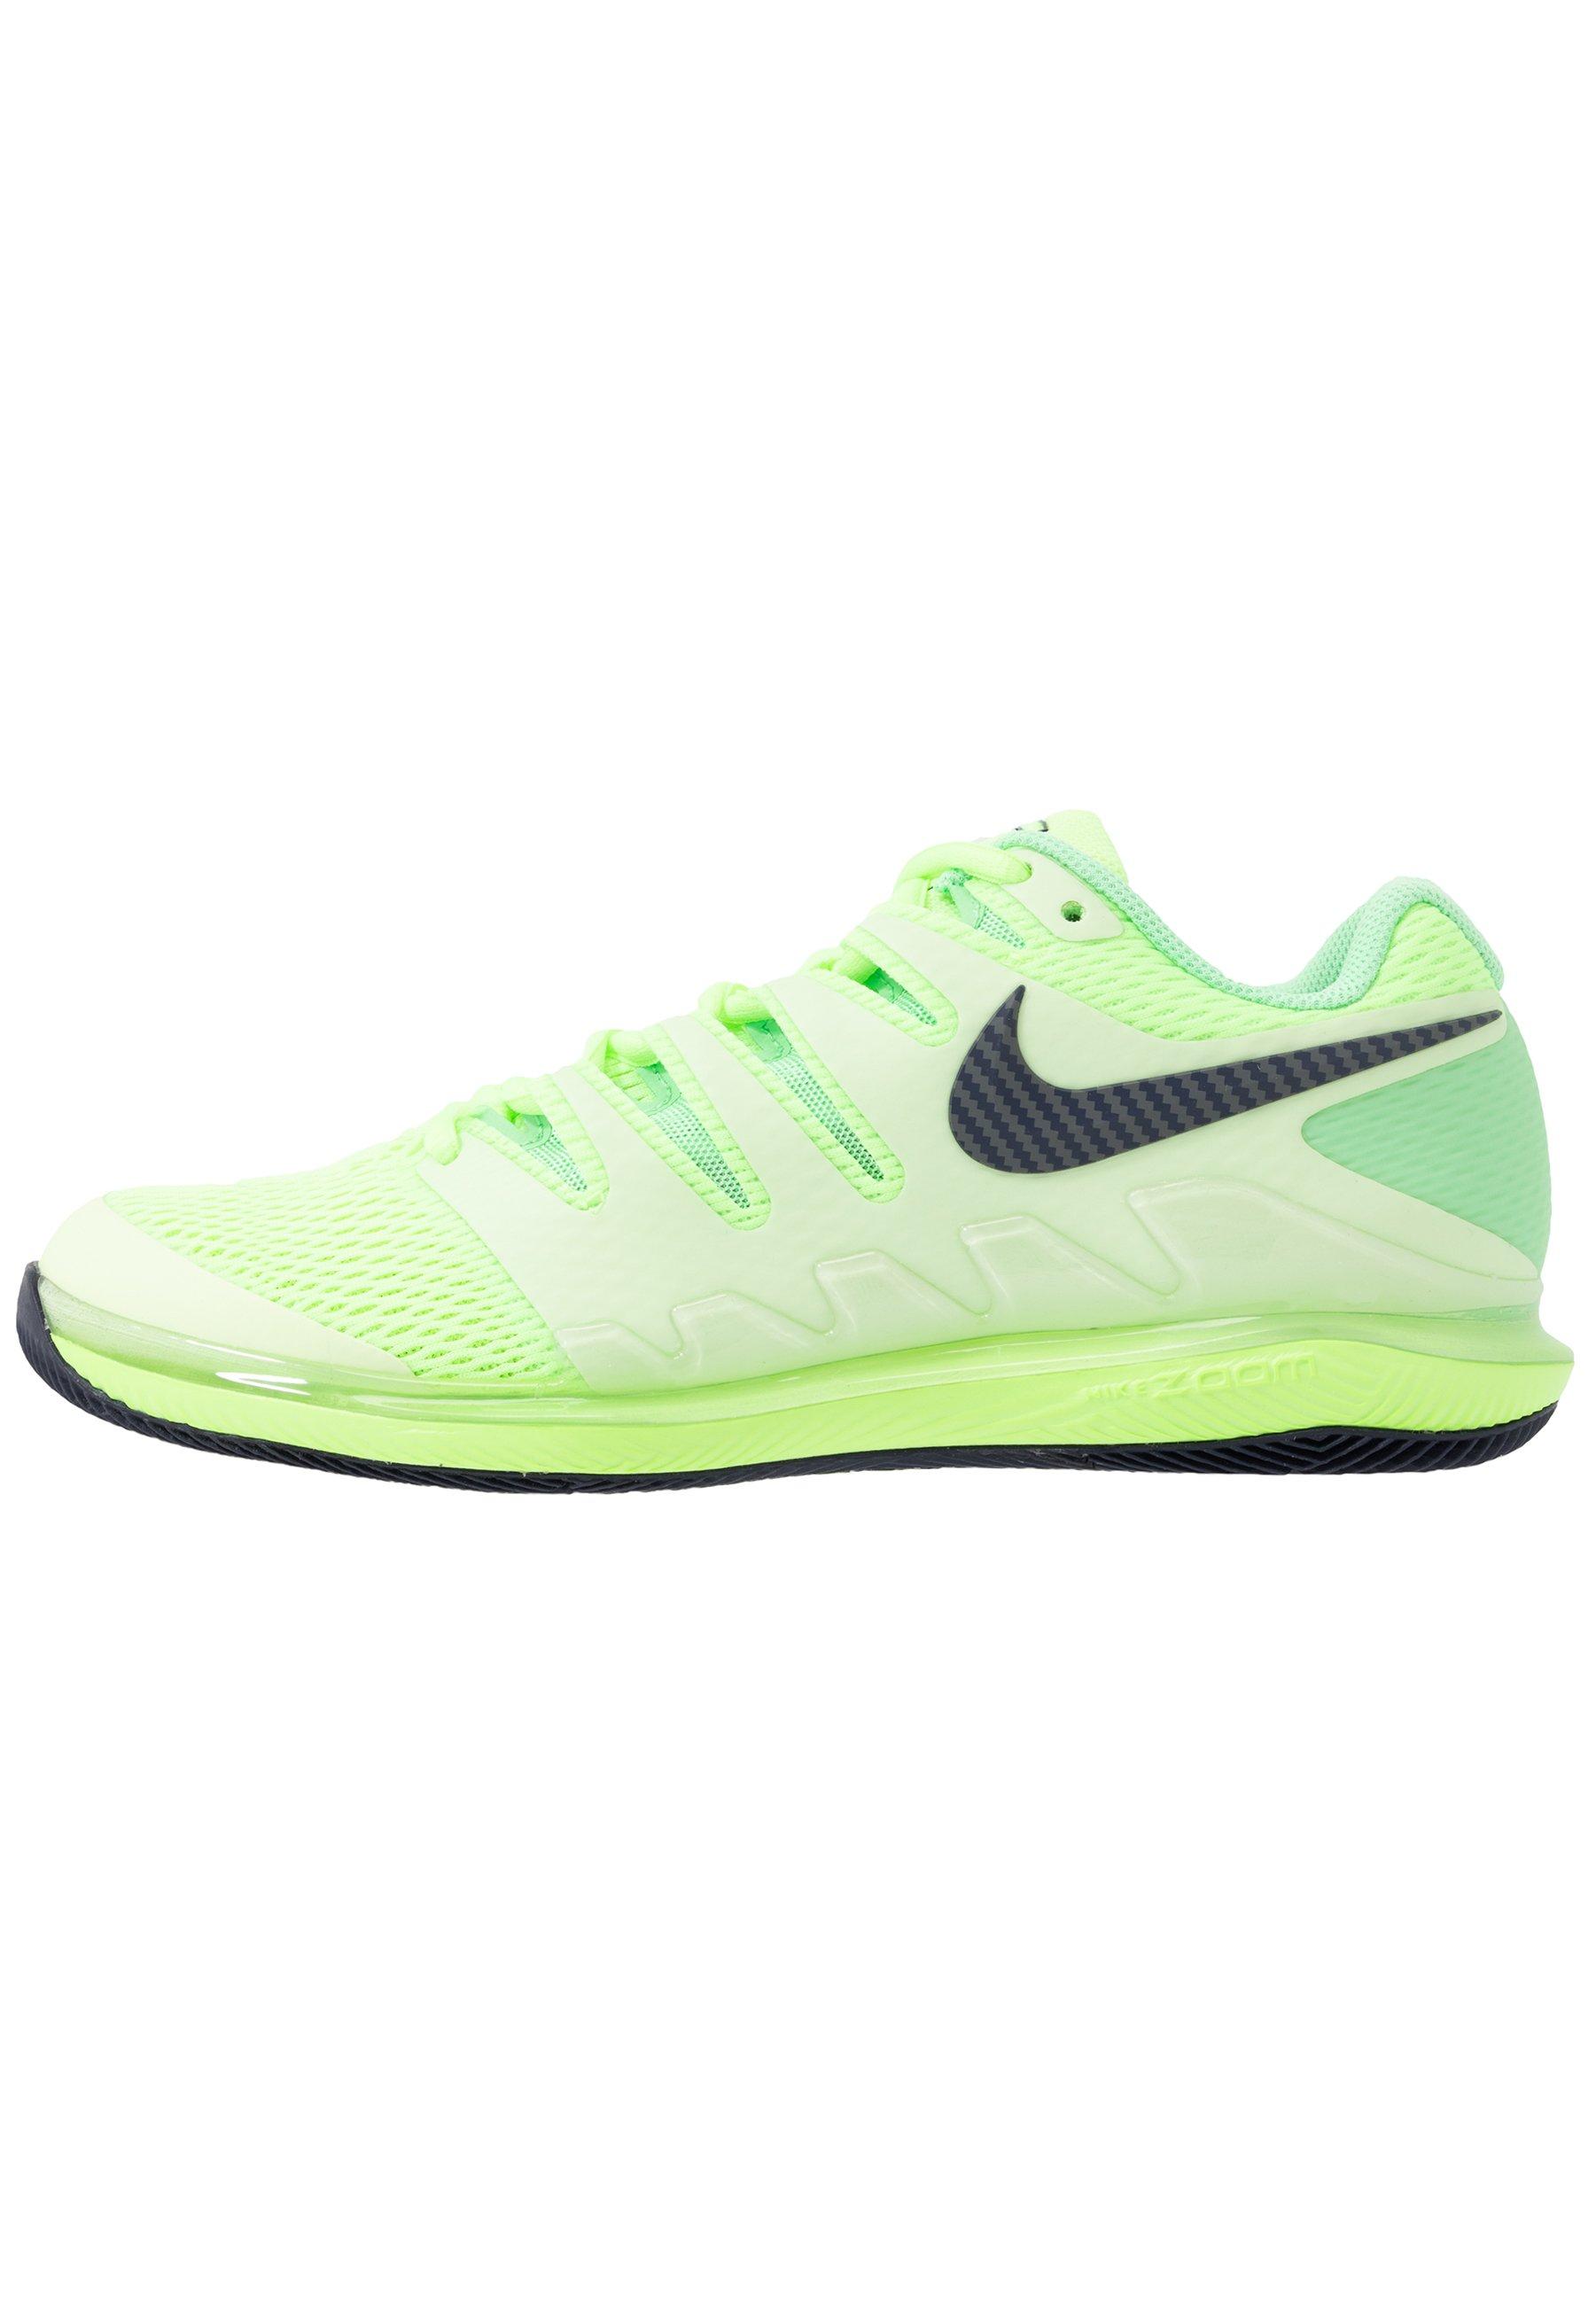 AIR ZOOM VAPOR X Scarpe da tennis per tutte le superfici ghost greenblackened bluebarely volt